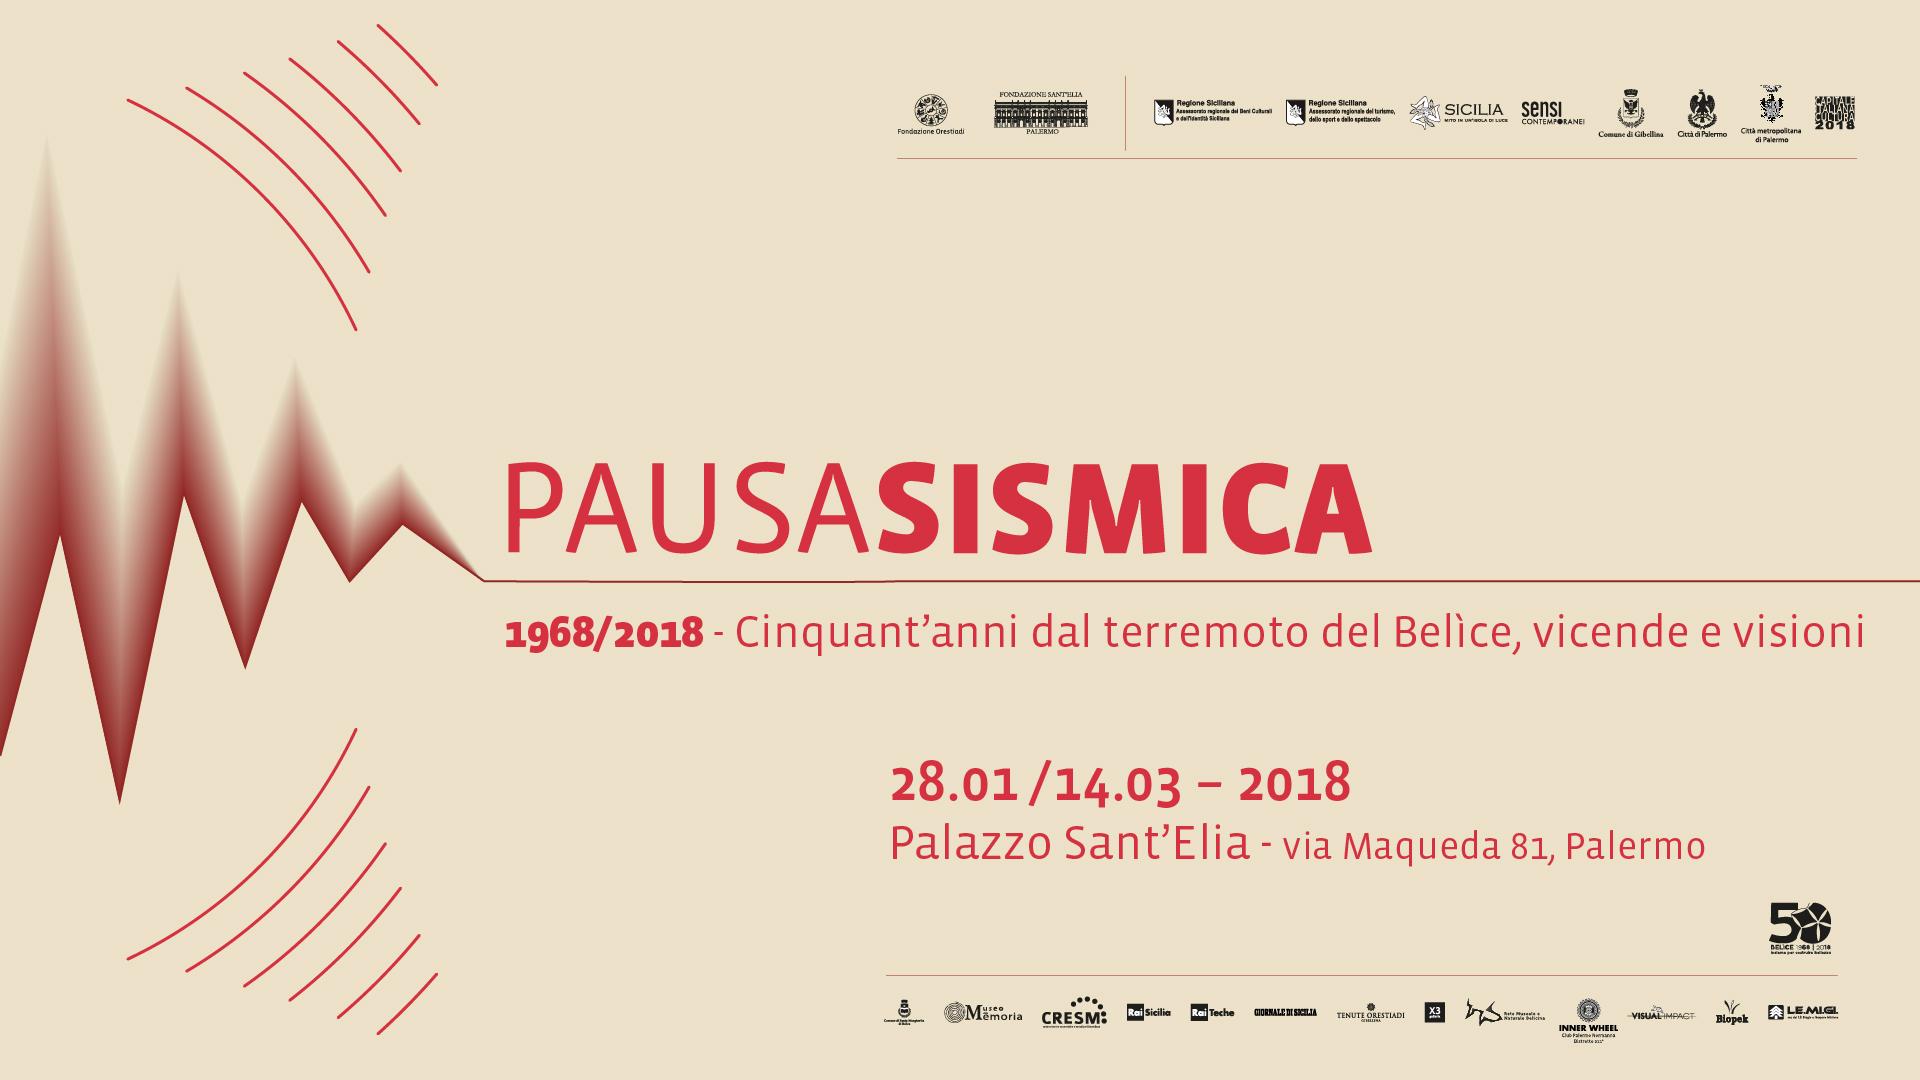 PAUSA SISMICA